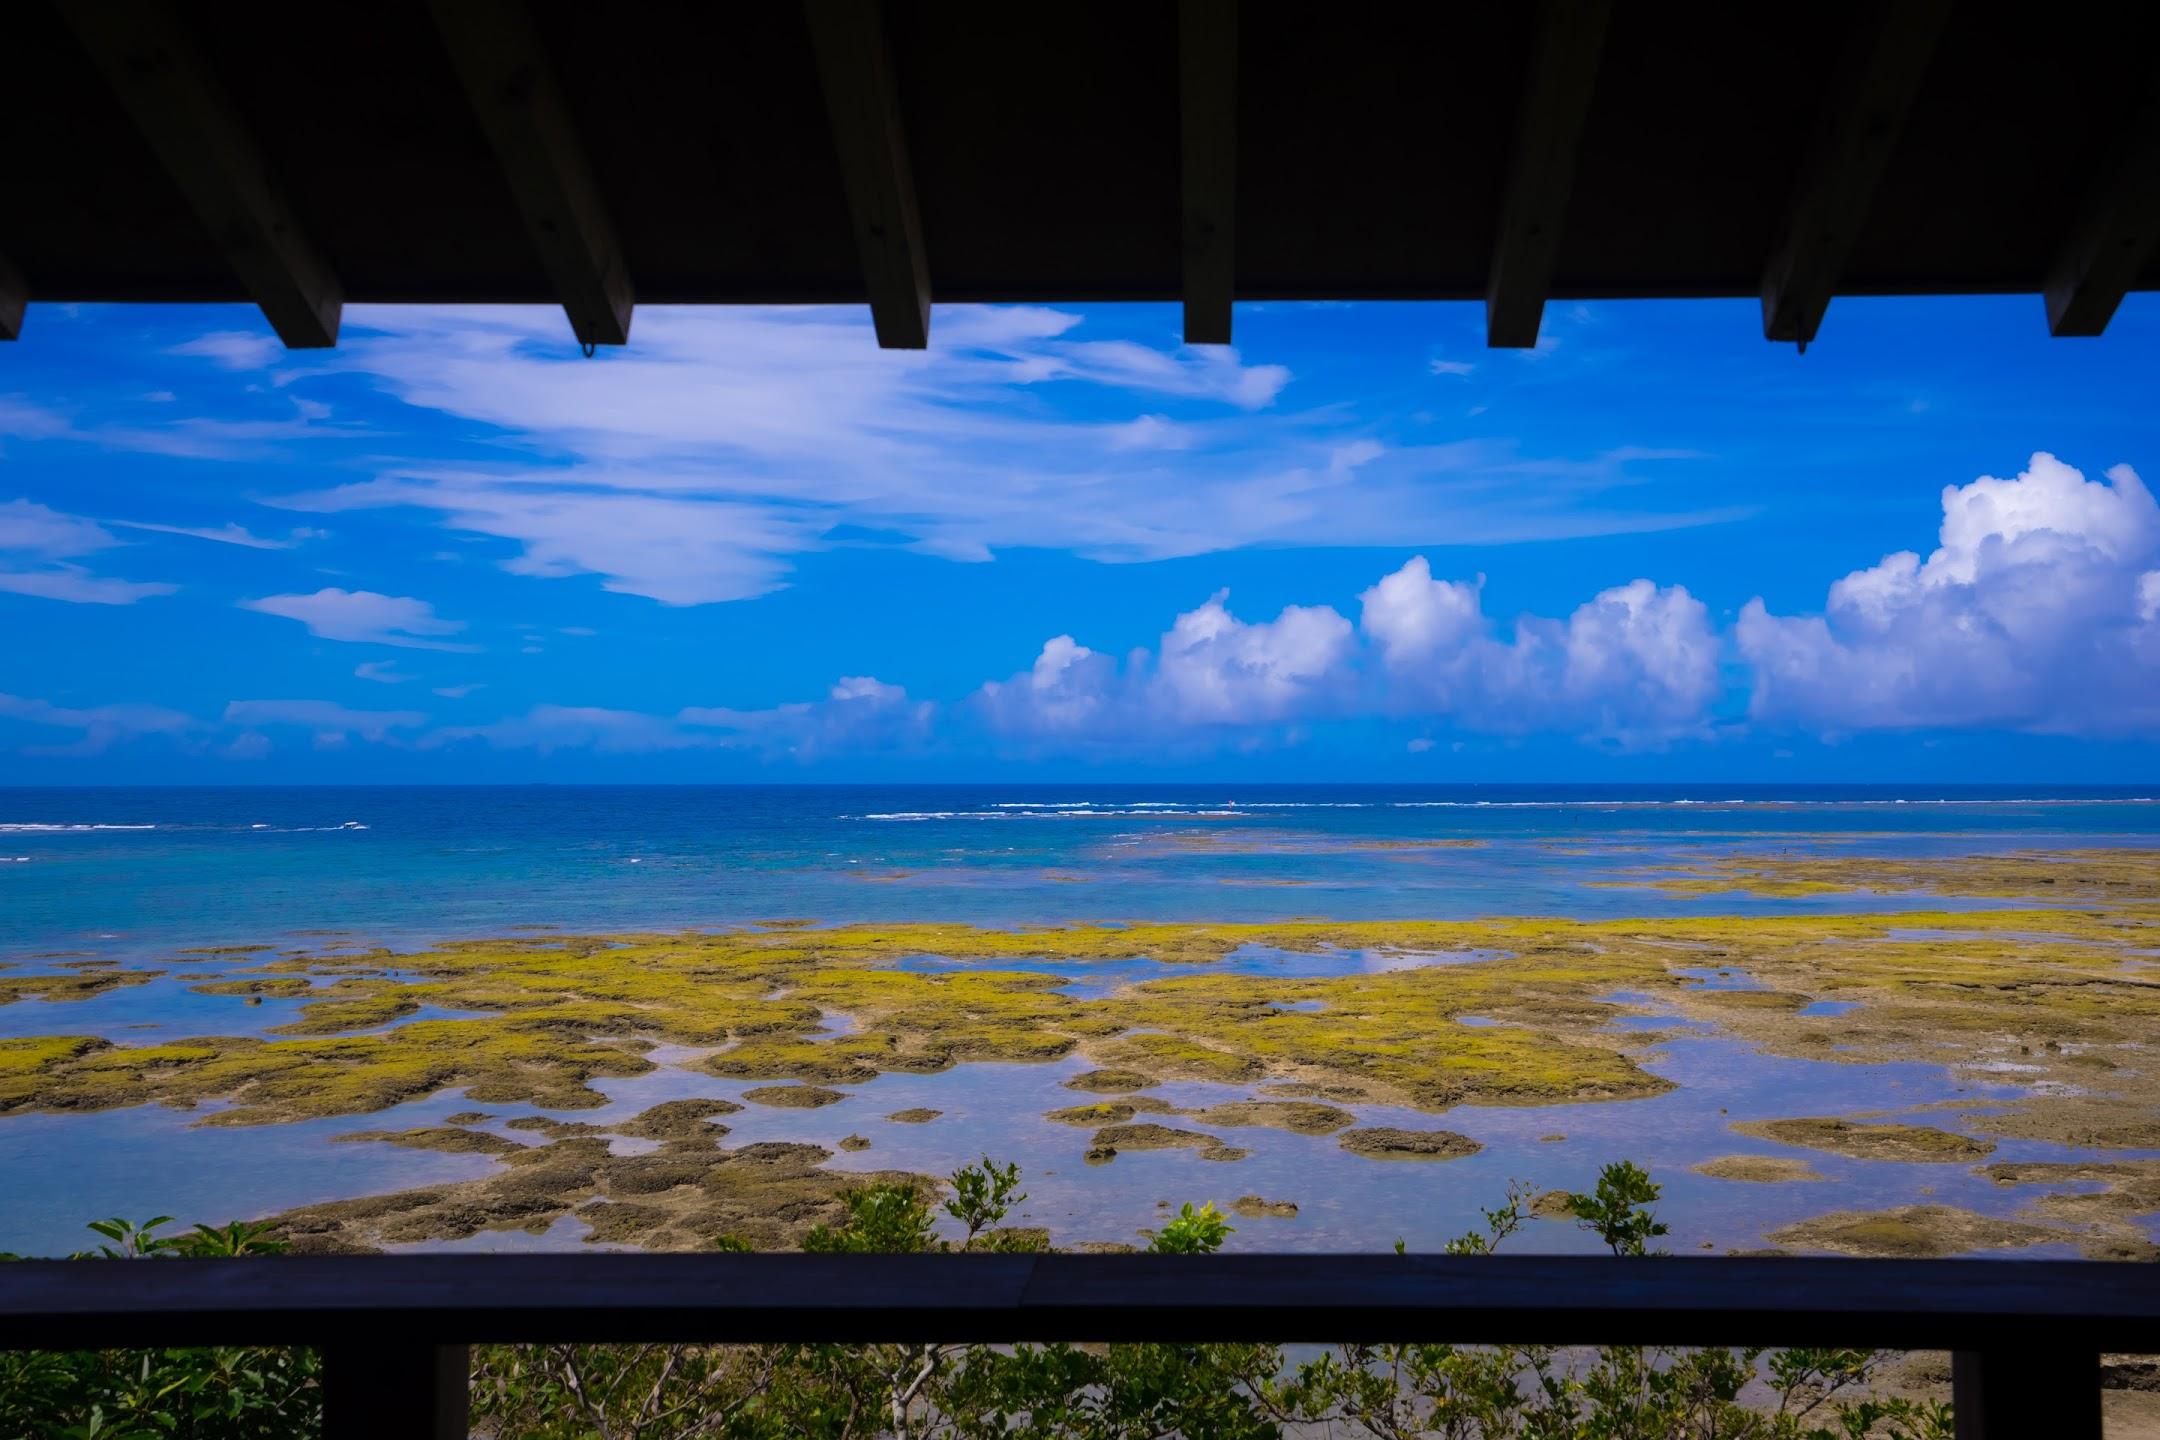 沖縄 新原ビーチ 百名伽藍2